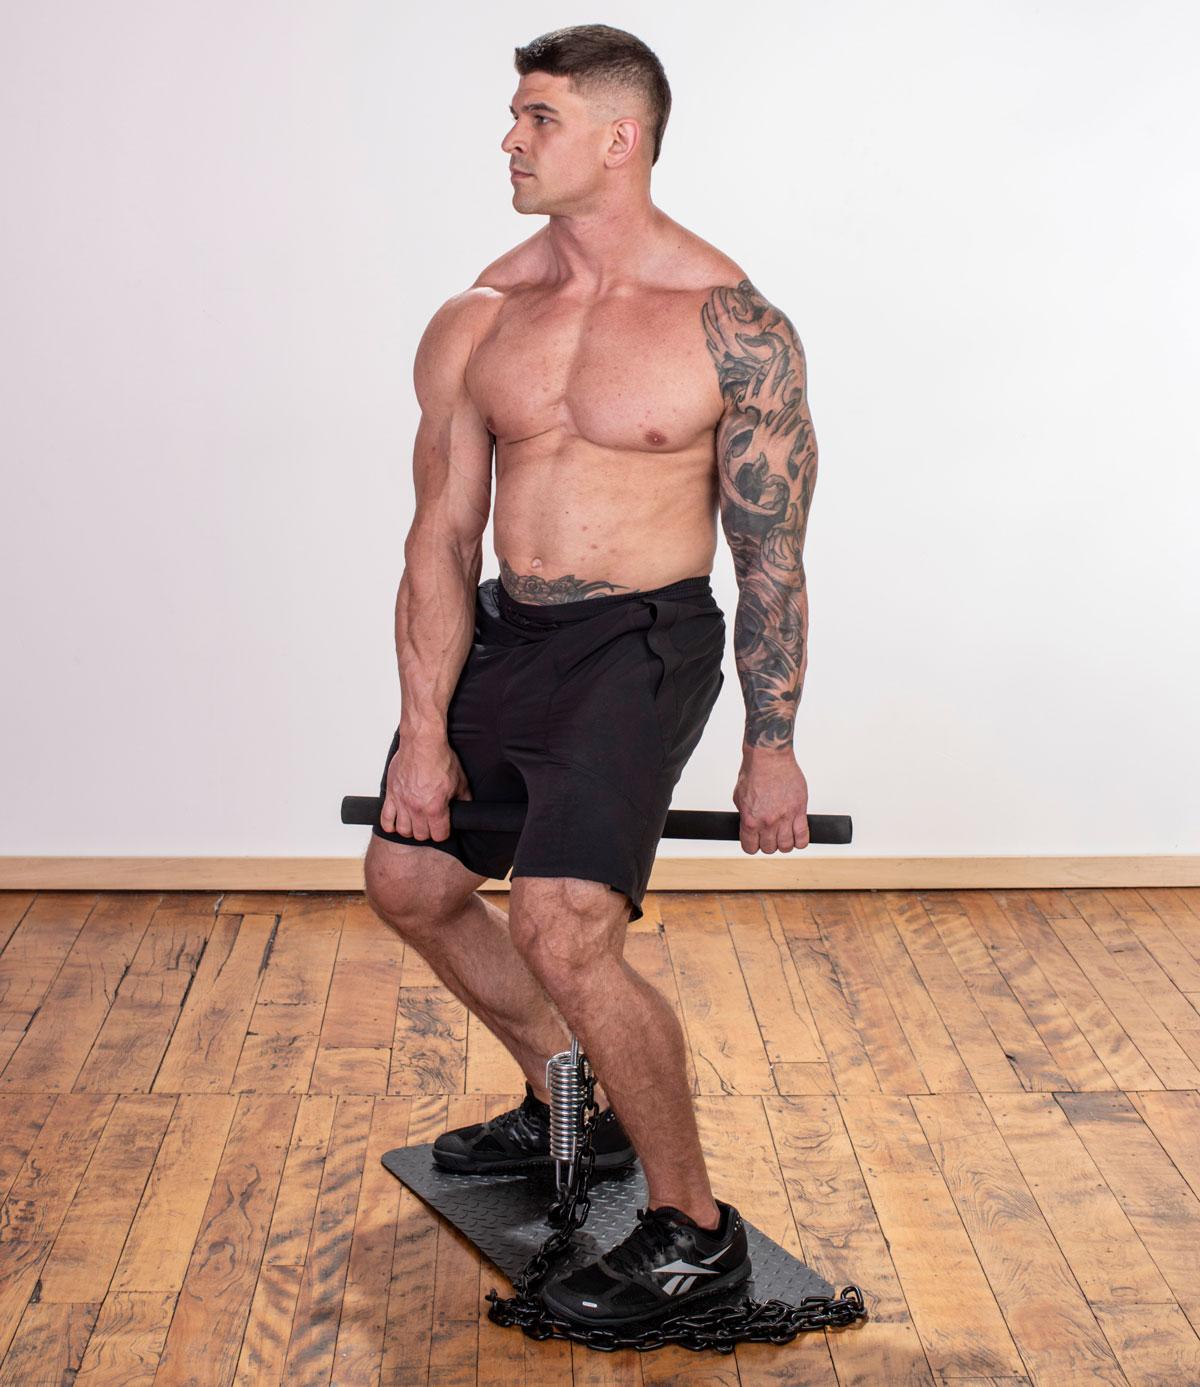 muscular male athlete performing Isochain Jefferson Deadlift